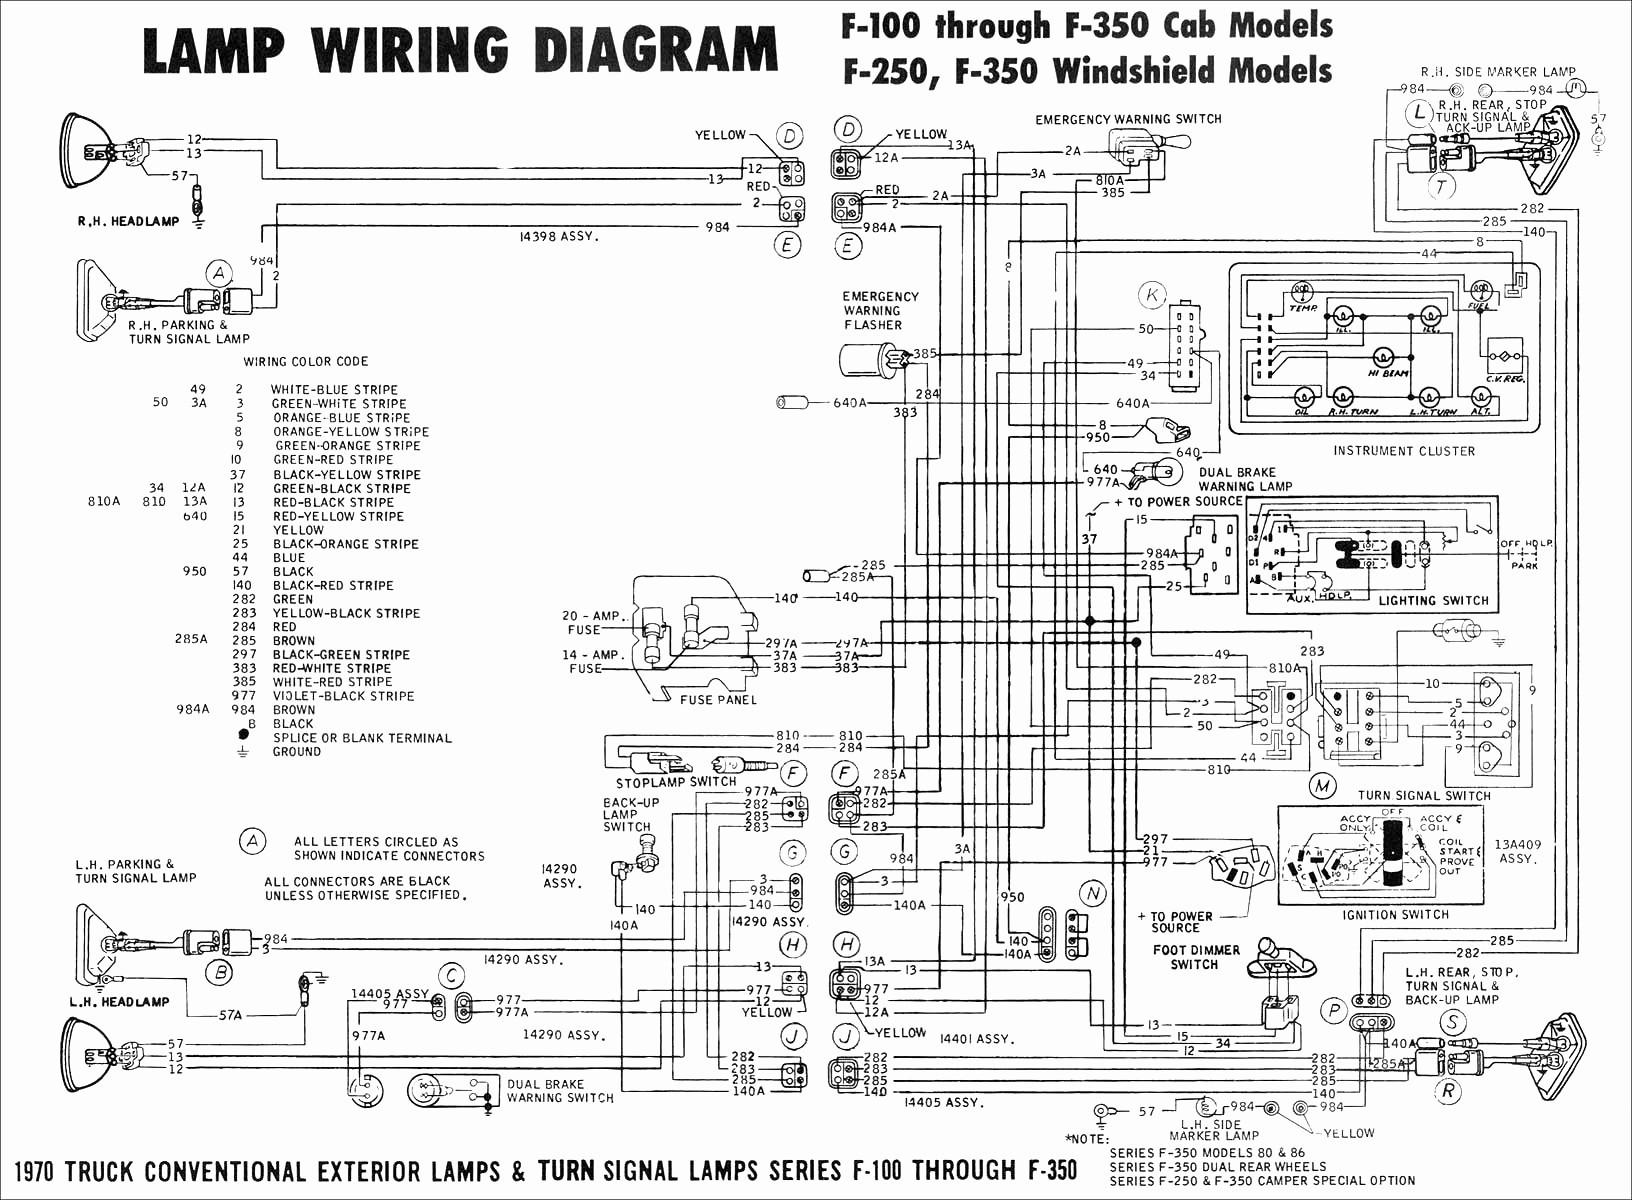 2003 toyota Rav4 Engine Diagram 2001 7 3 Powerstroke Engine Diagram Worksheet and Wiring Diagram • Of 2003 toyota Rav4 Engine Diagram